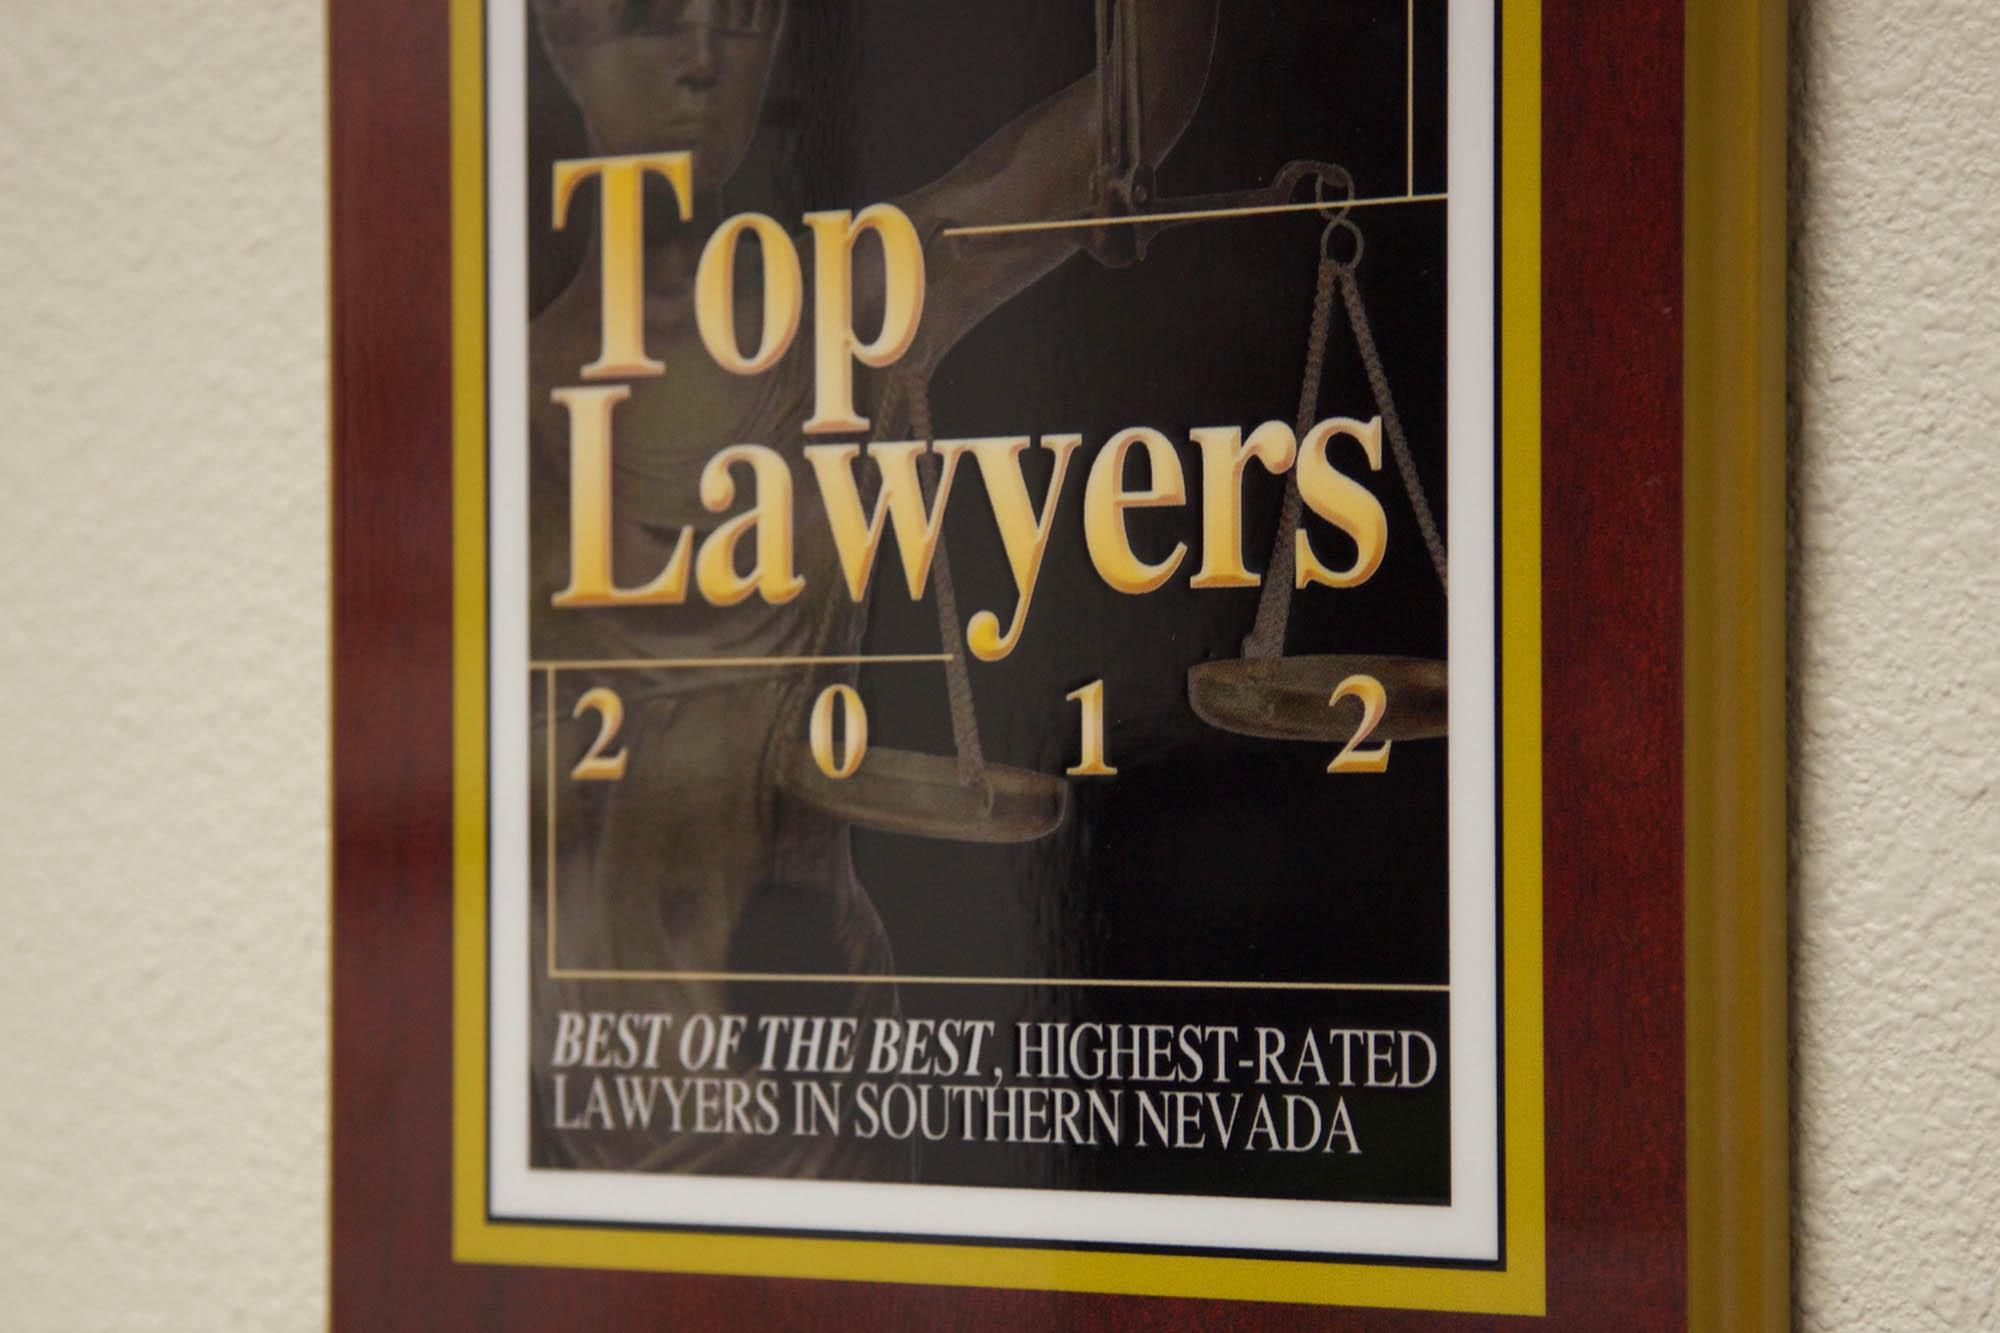 Top Lawyer in Las Vegas